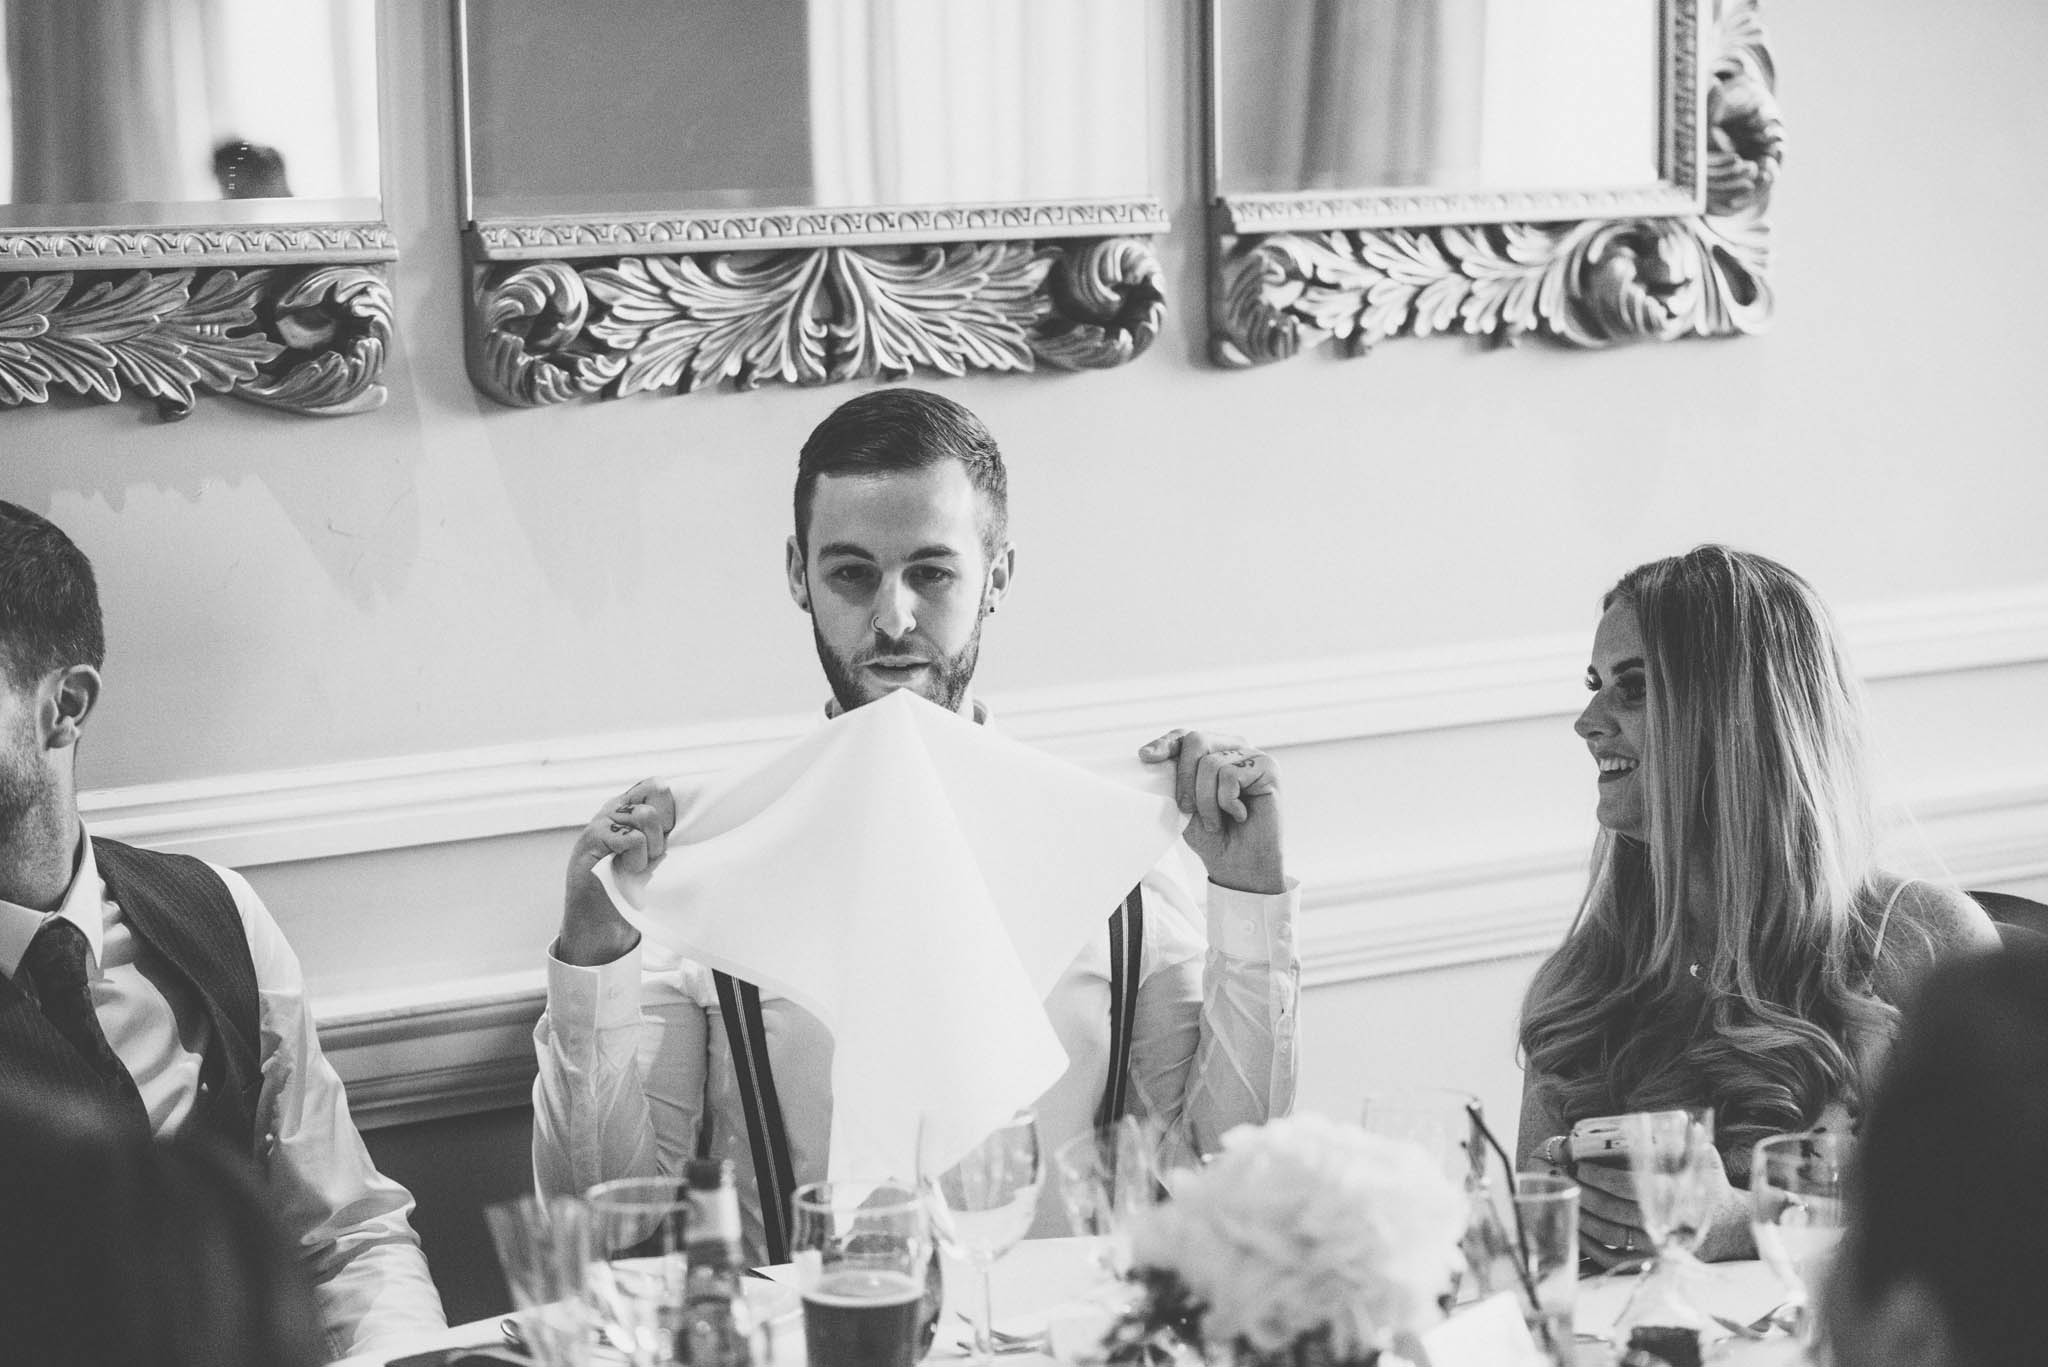 napkin-wedding-blog-scott-stockwell-photography-end-2017.jpg